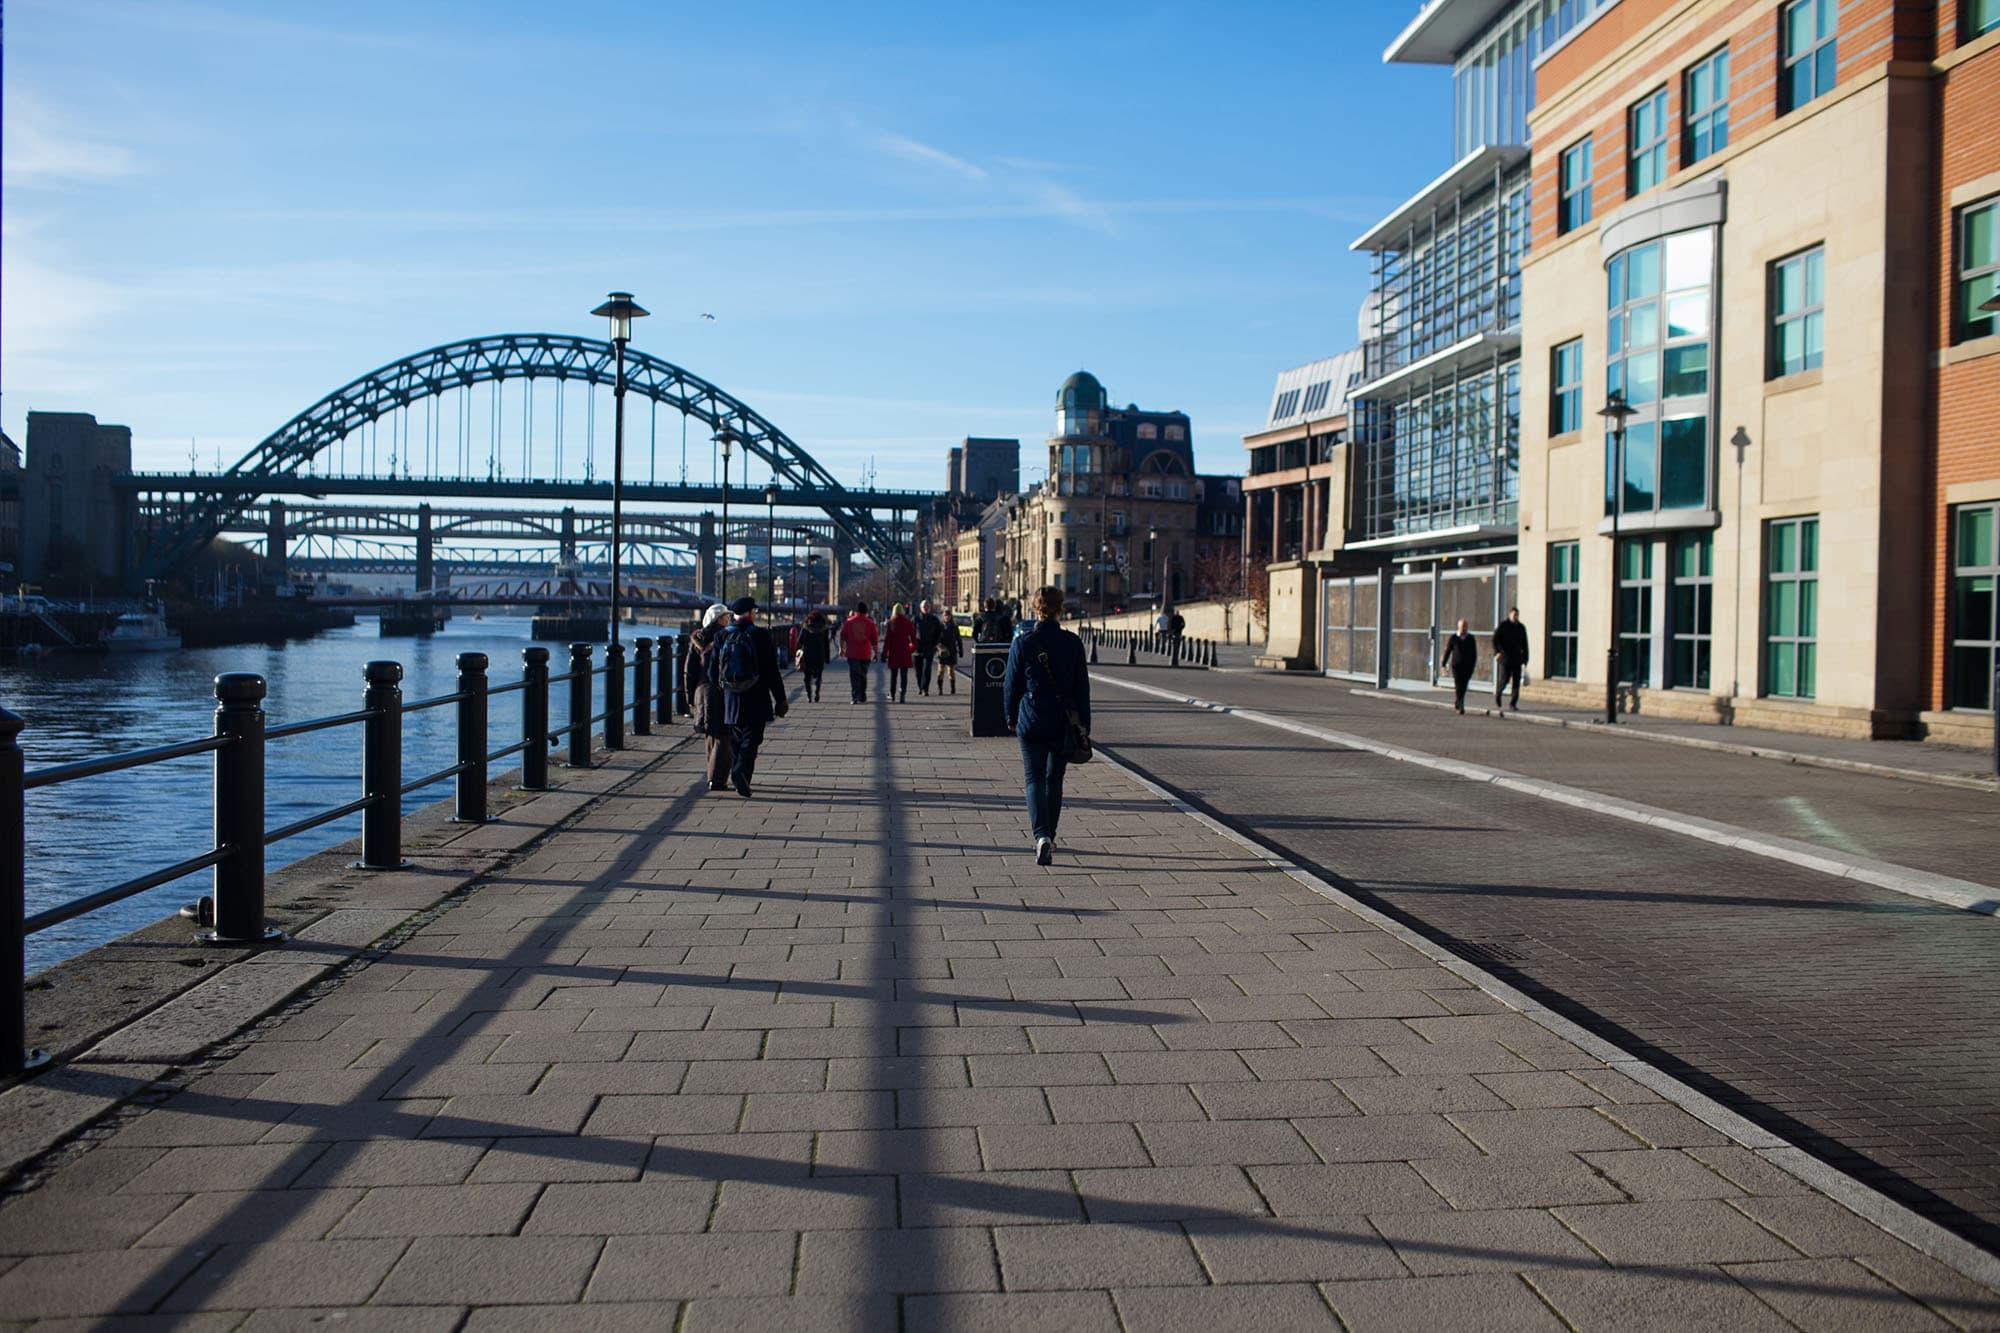 Newcastle, England